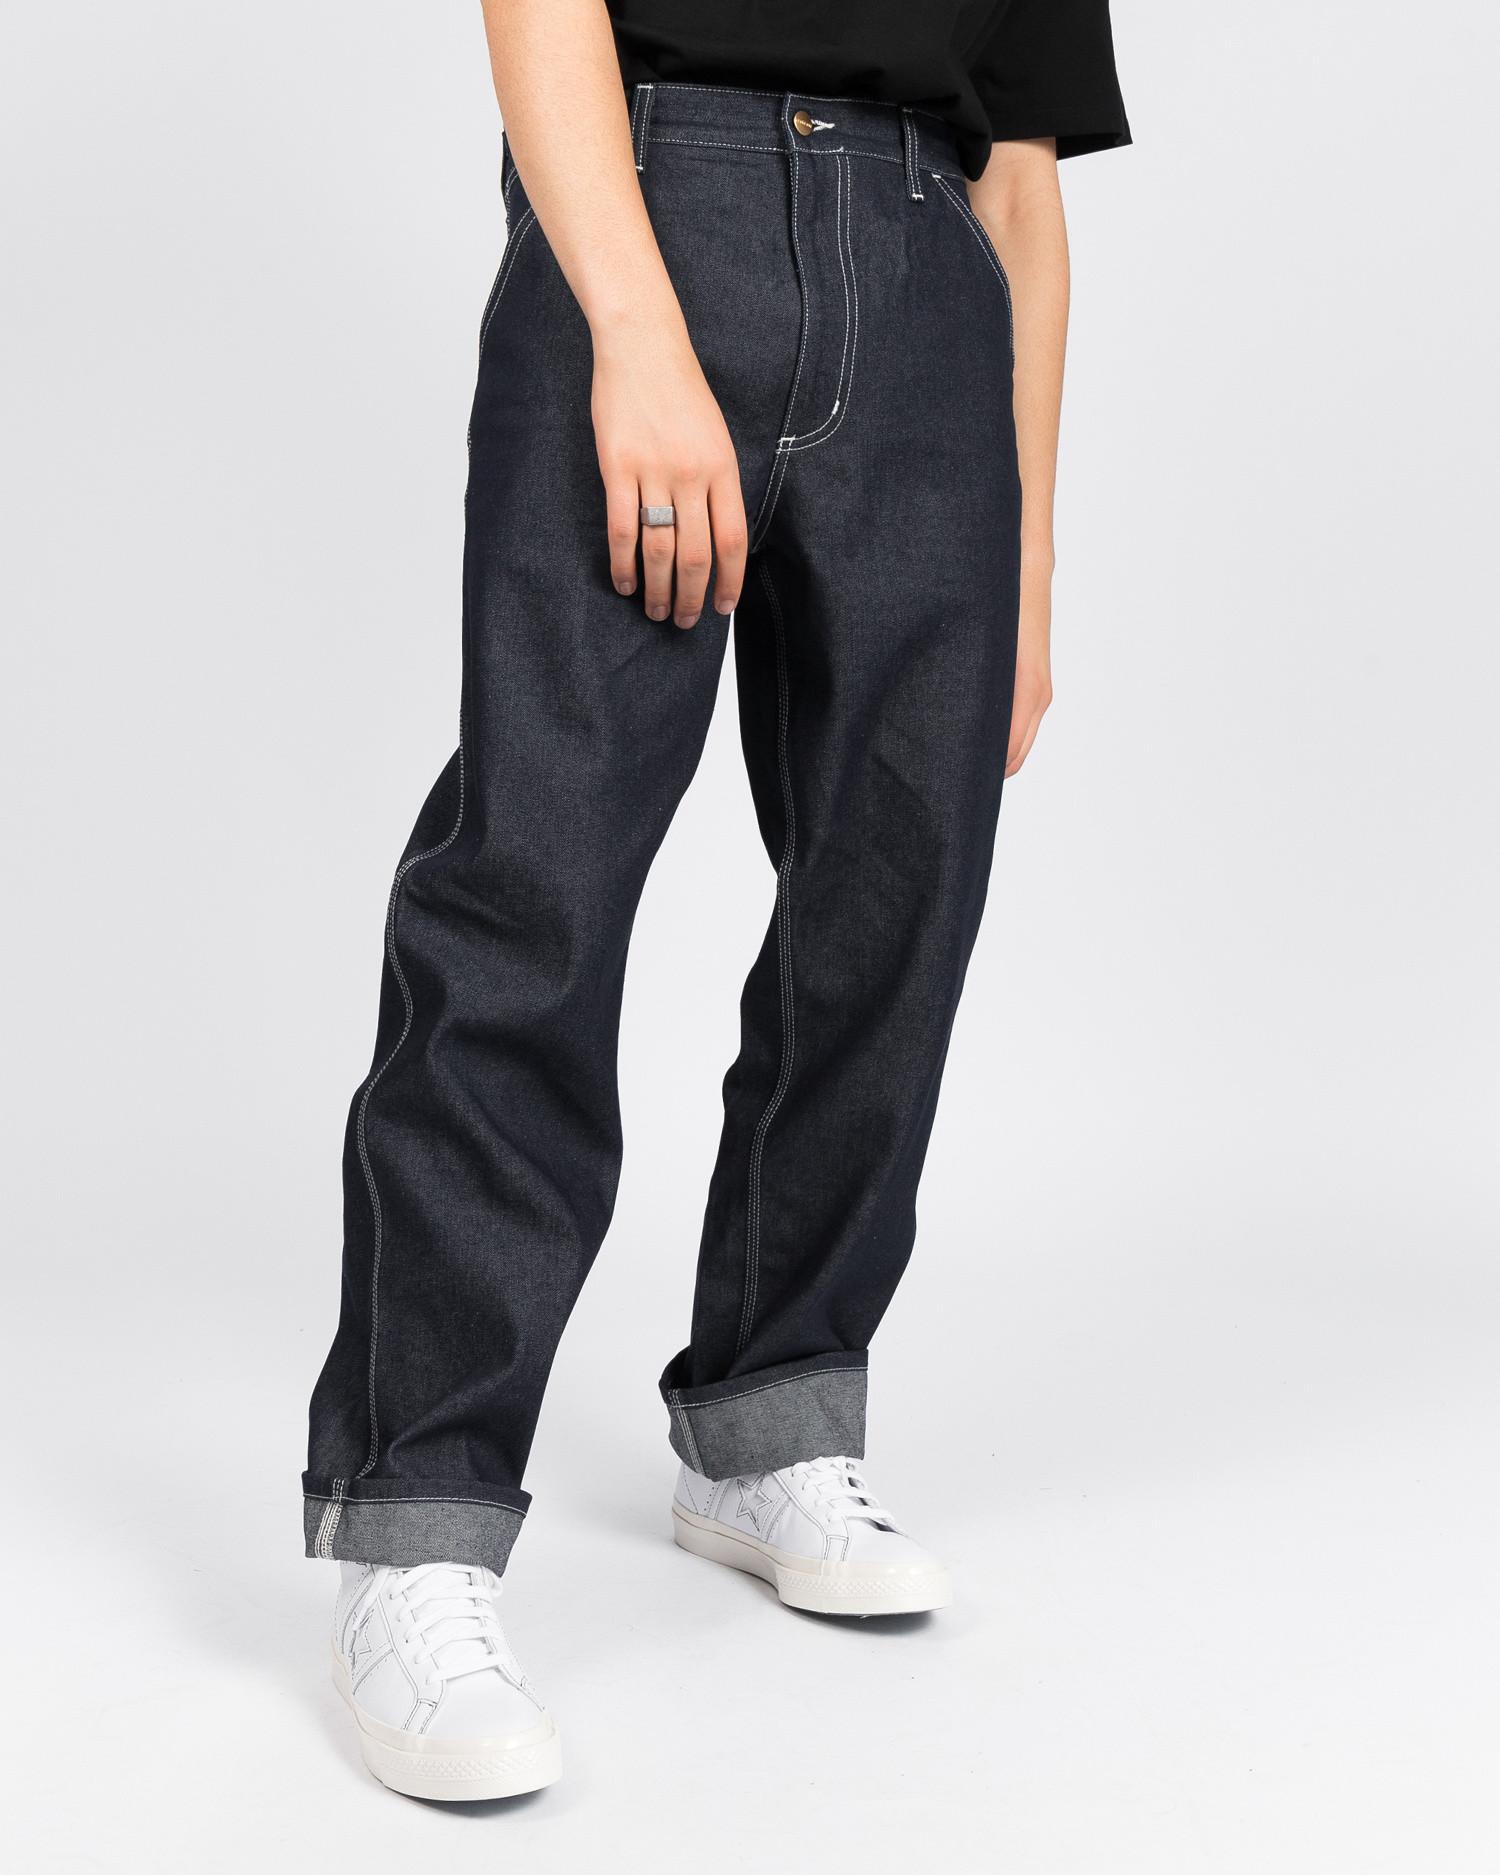 Carhartt Simple Pant Blue Rigid